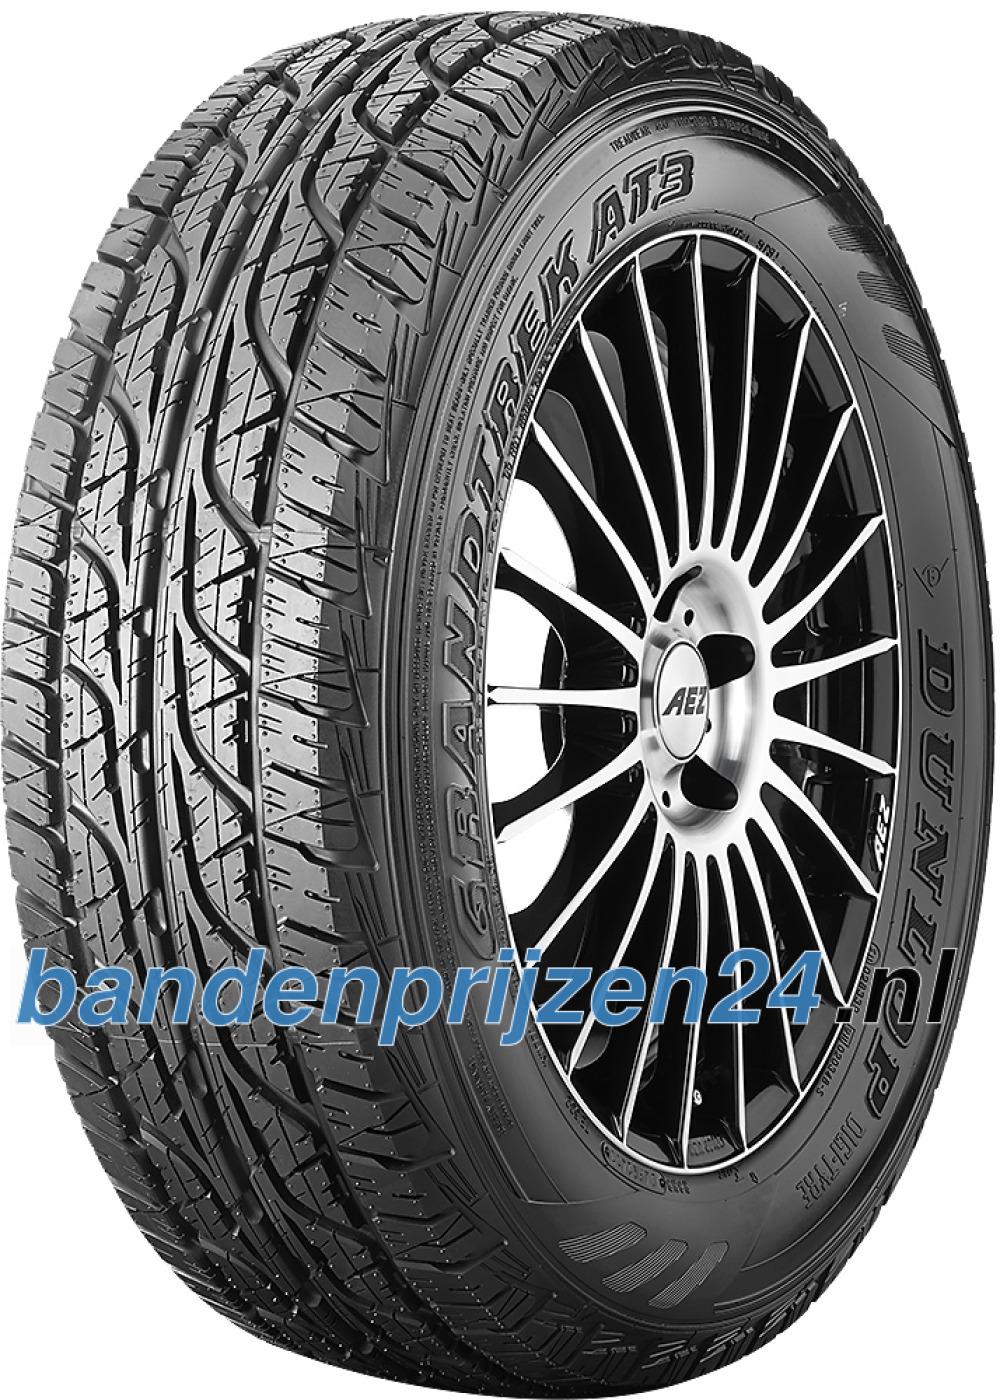 Dunlop Grandtrek AT 3 ( LT235/75 R15 104/101S OWL )